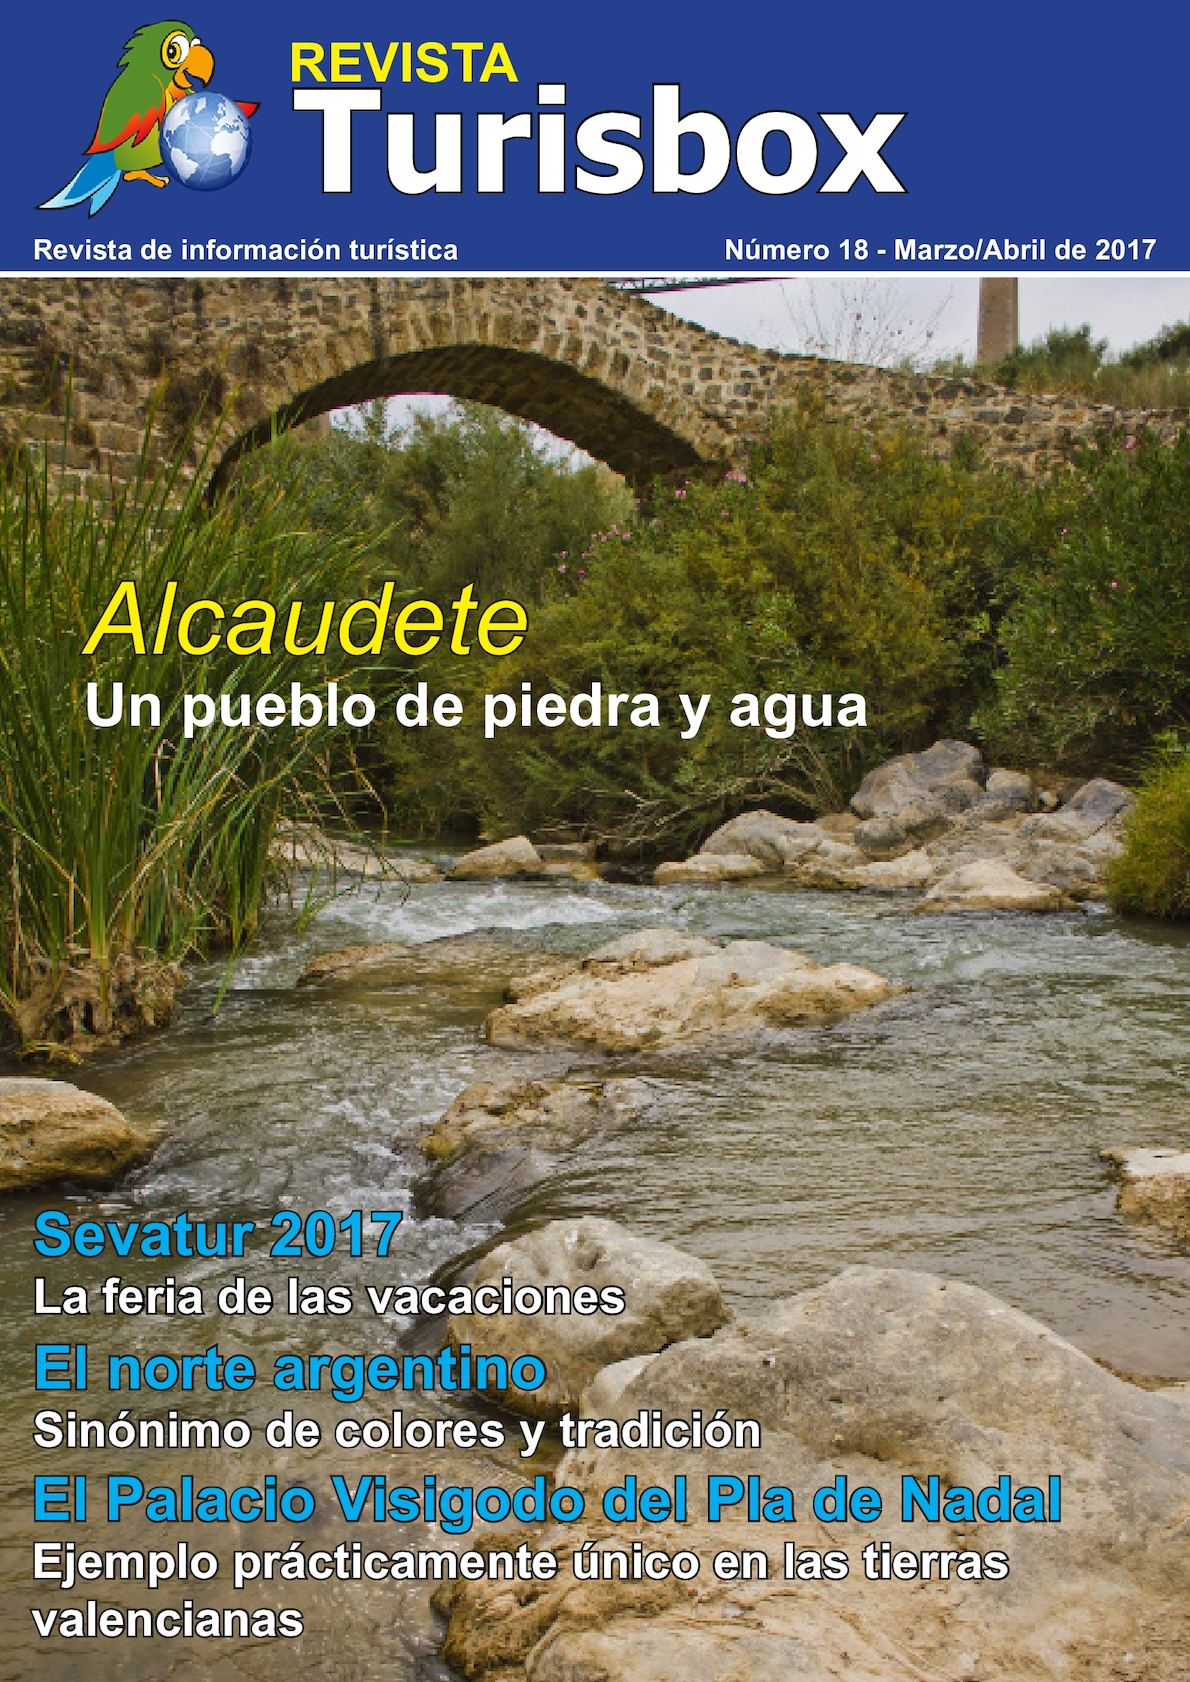 Revista Turisbox Nº 18 - Turismo